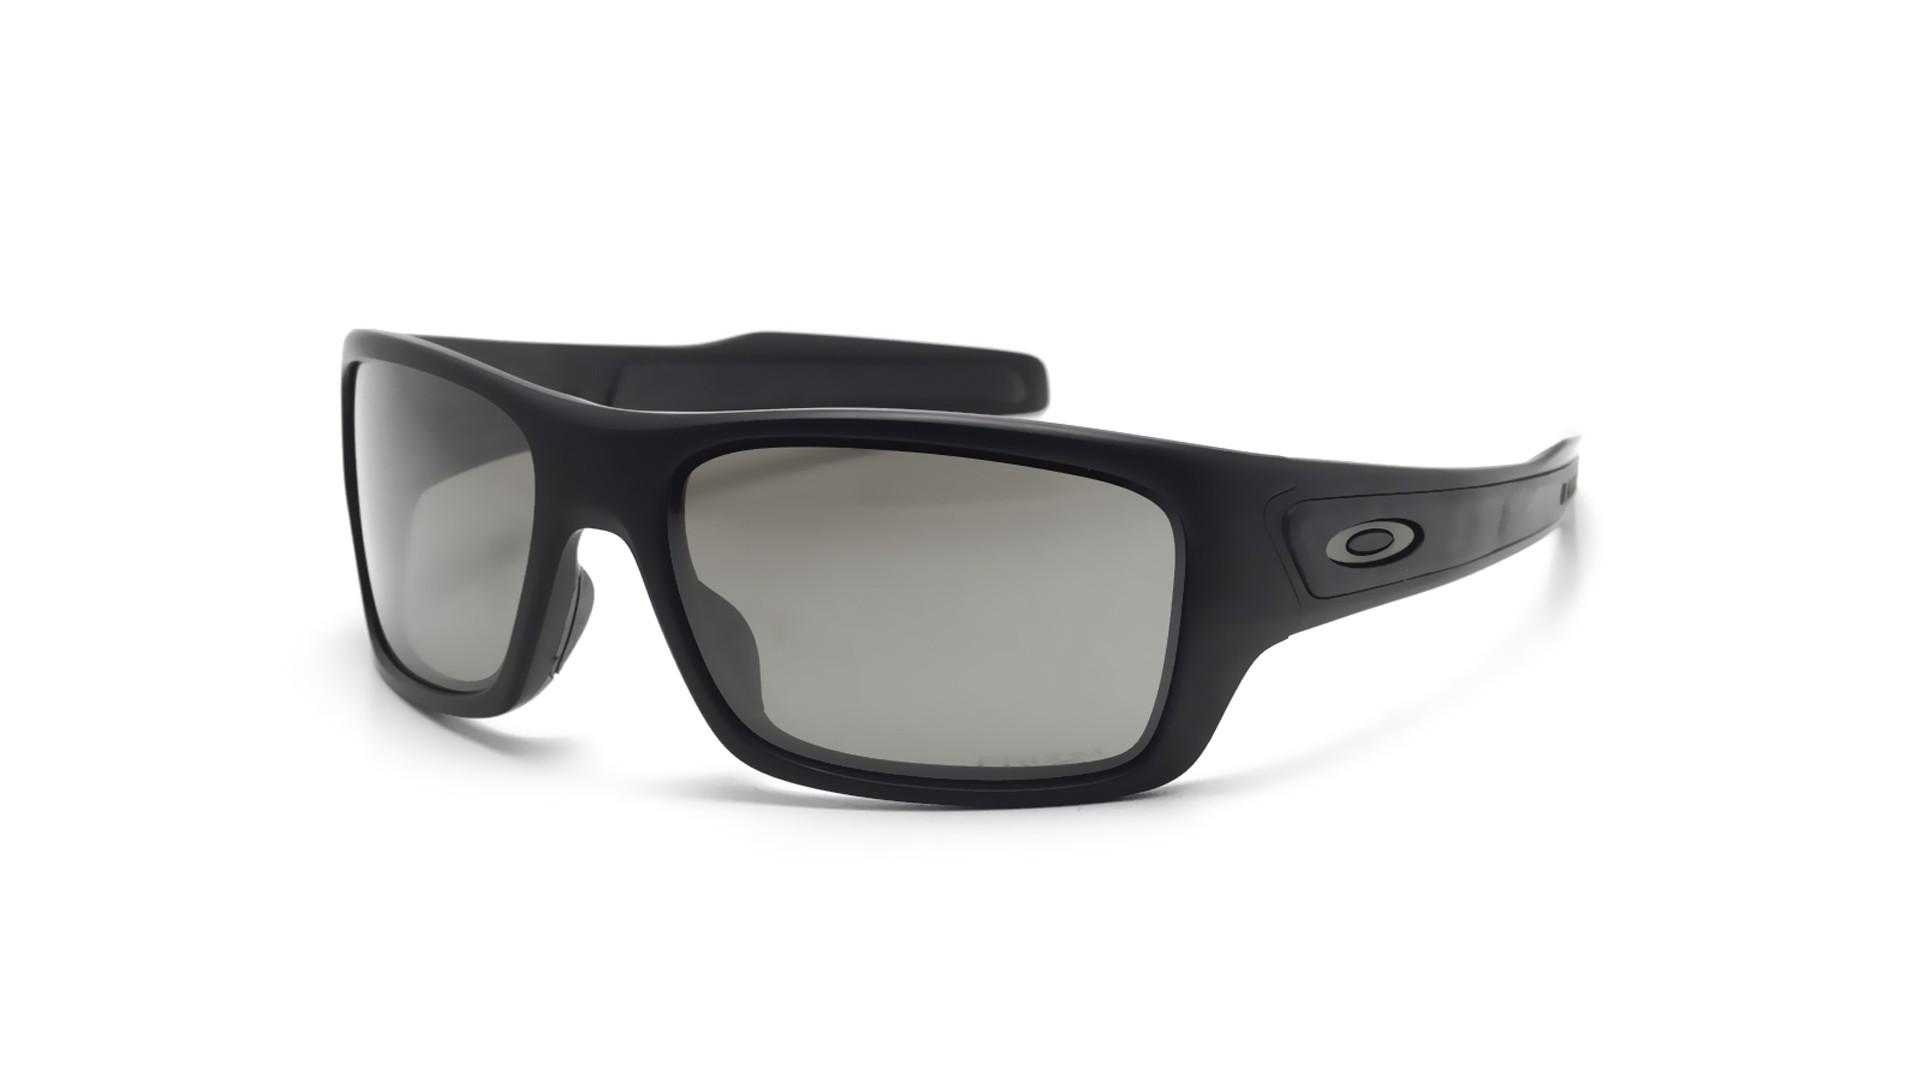 9162684b0e8 Sunglasses Oakley Turbine Xs Black Mat Prizm OJ9003 06 58-15 Junior  Polarized